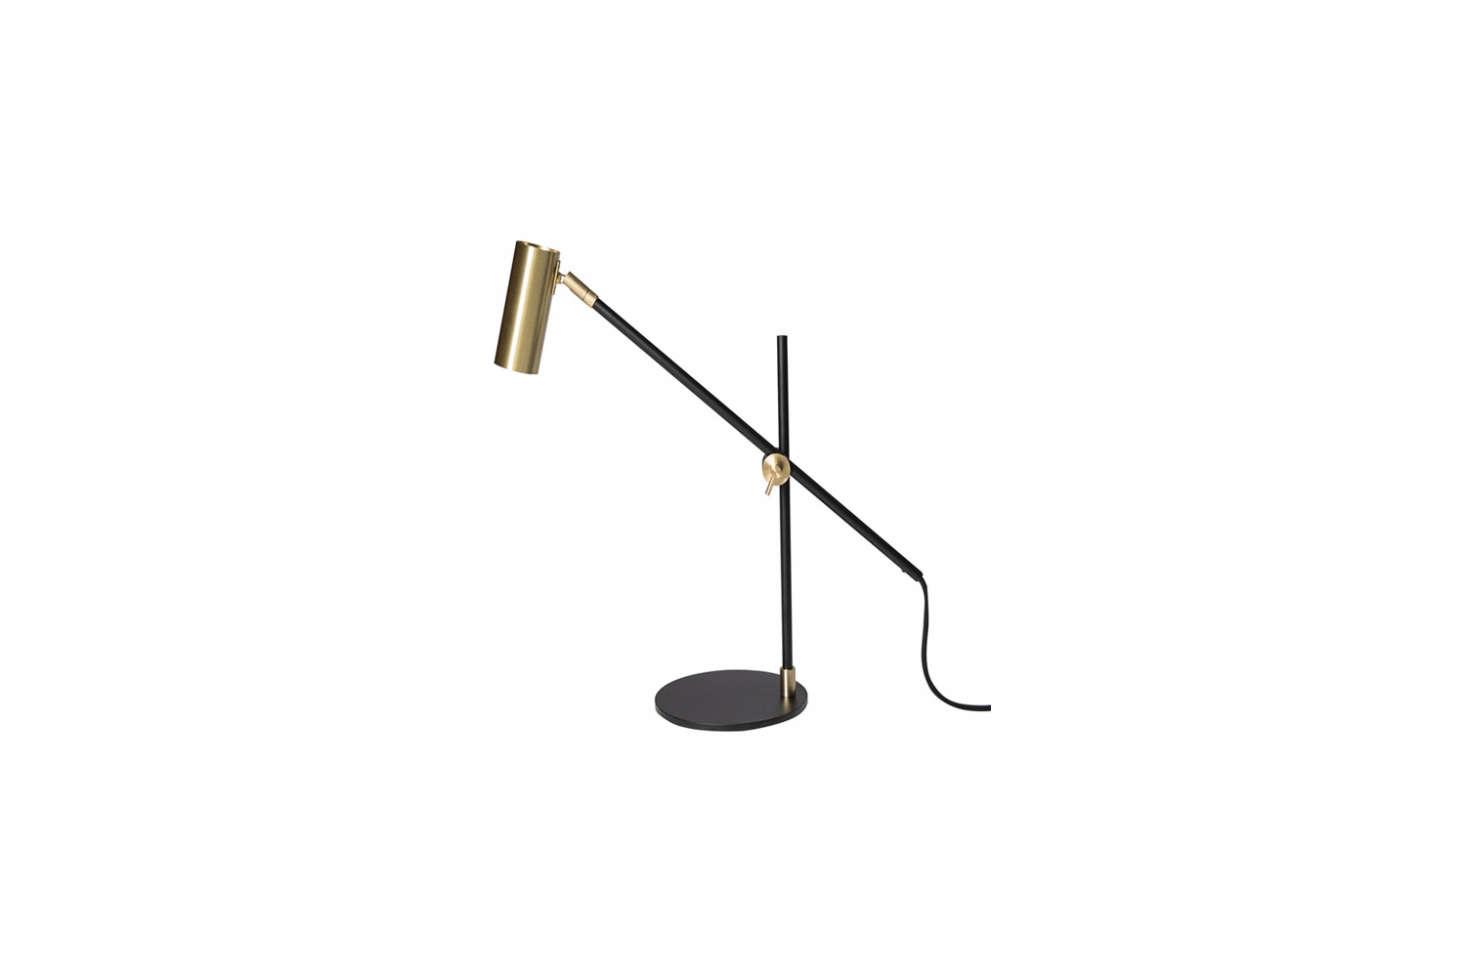 The bedside table lamps areRubn Lektor Desk Lamps in black brass for €5 each.